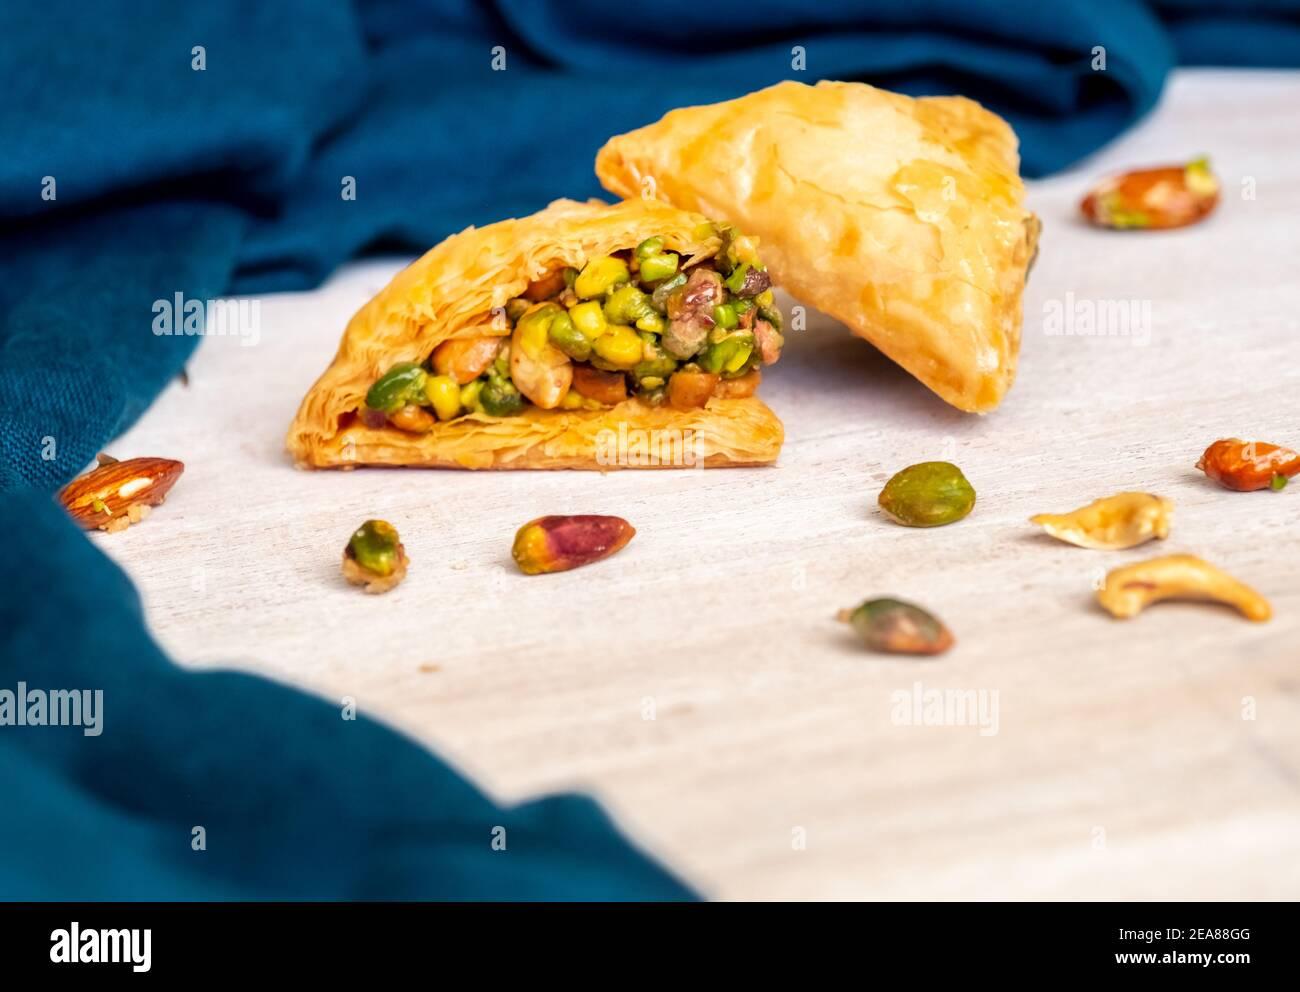 Dulces árabes llamados baklava llenos de pistacho Foto de stock